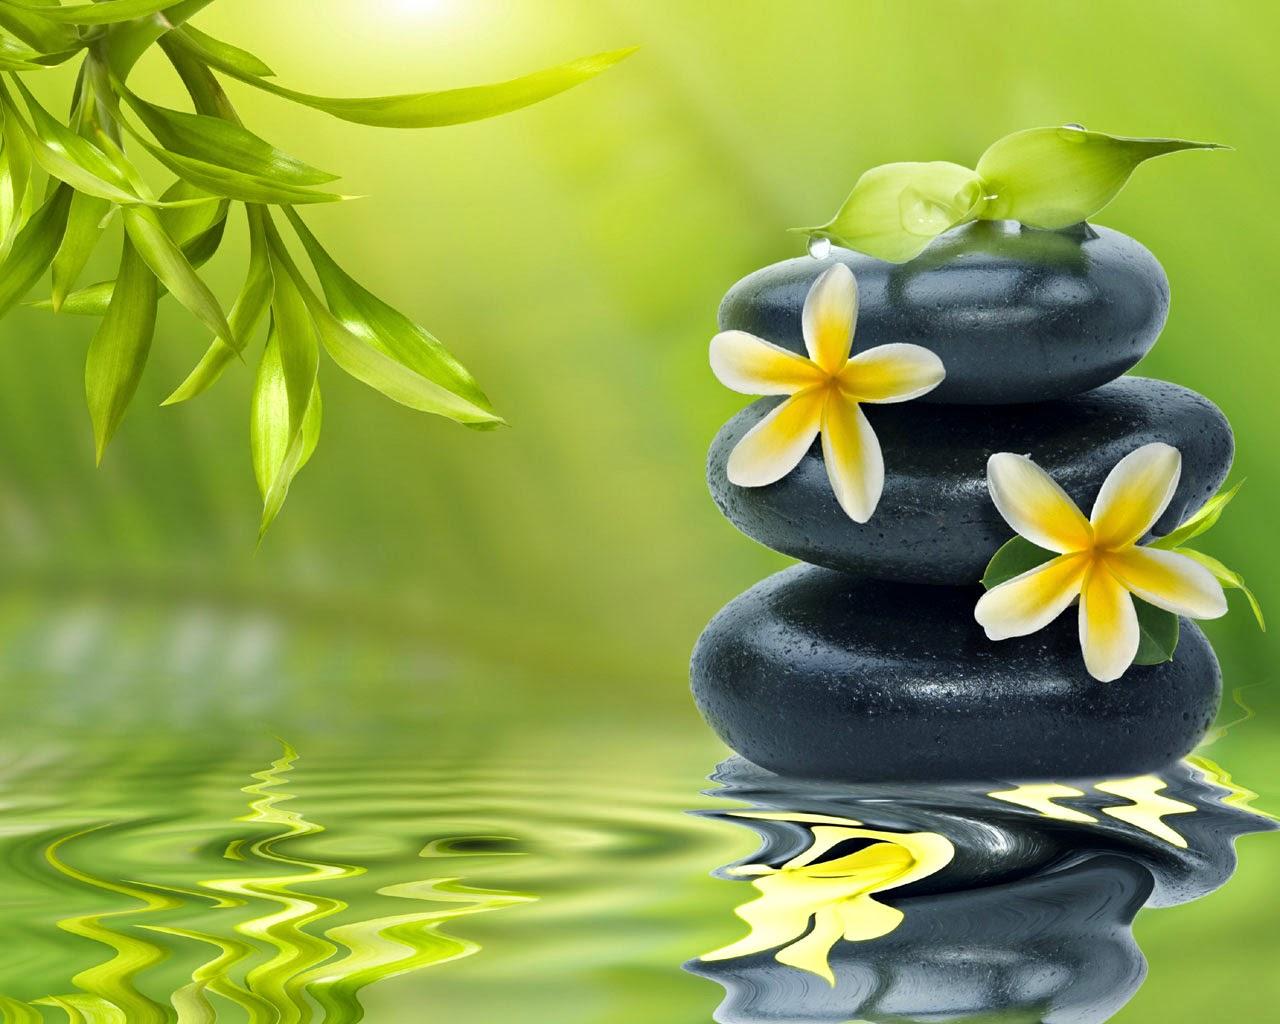 Zen Relaxation Backgrounds: Peaceful Zen